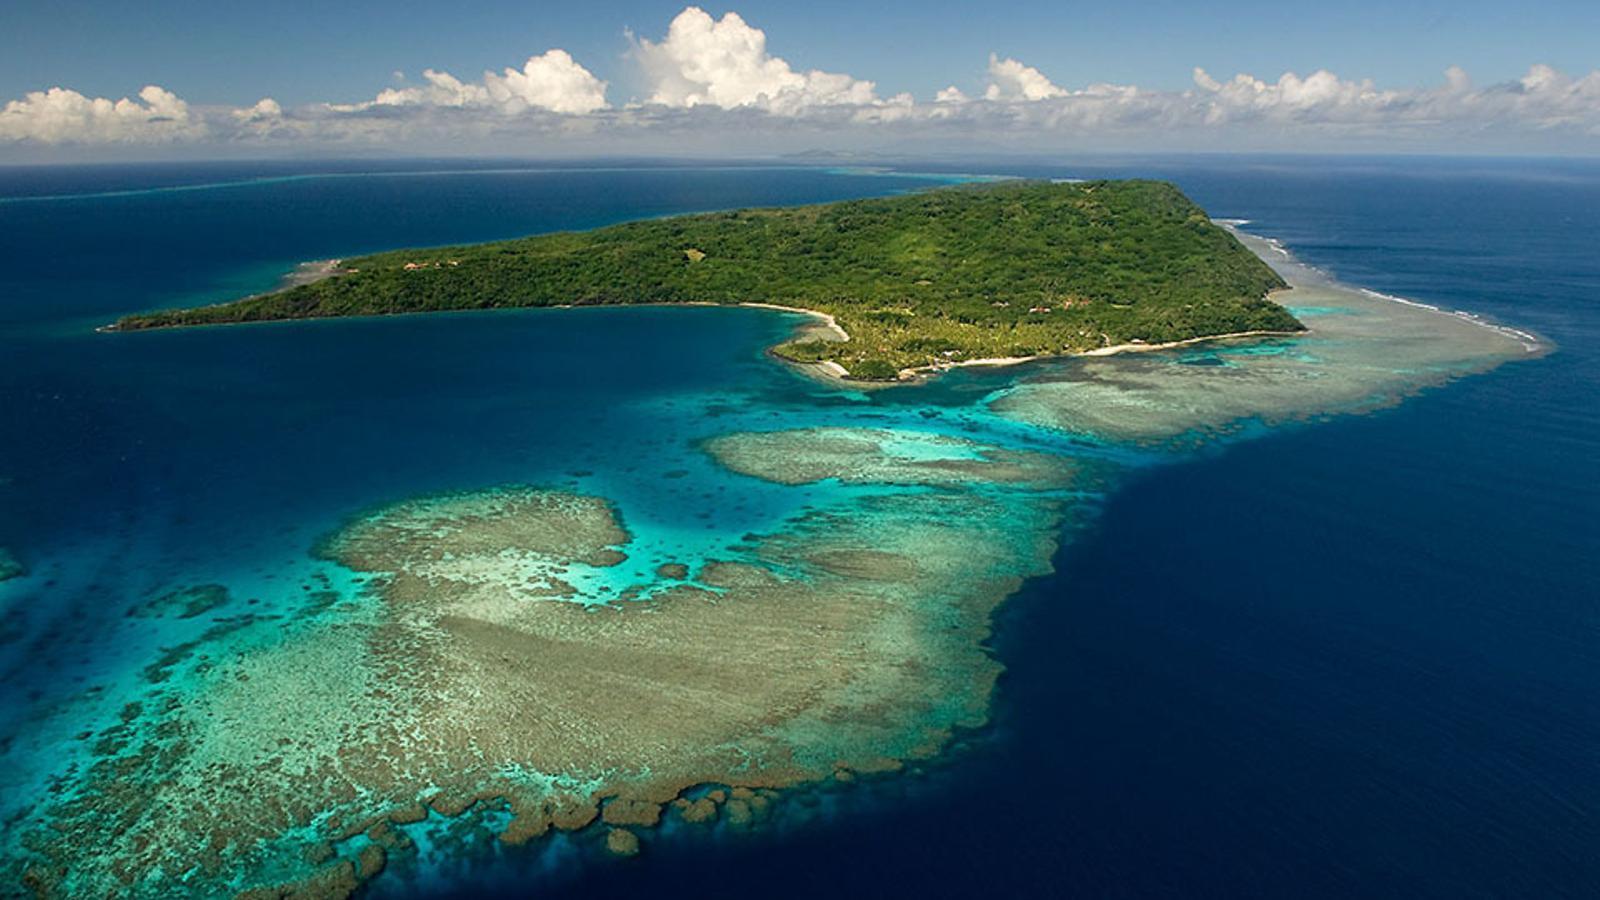 Imatge aèria de la paradisíaca illa de Wakaya / CONCIERGE AUCTIONS